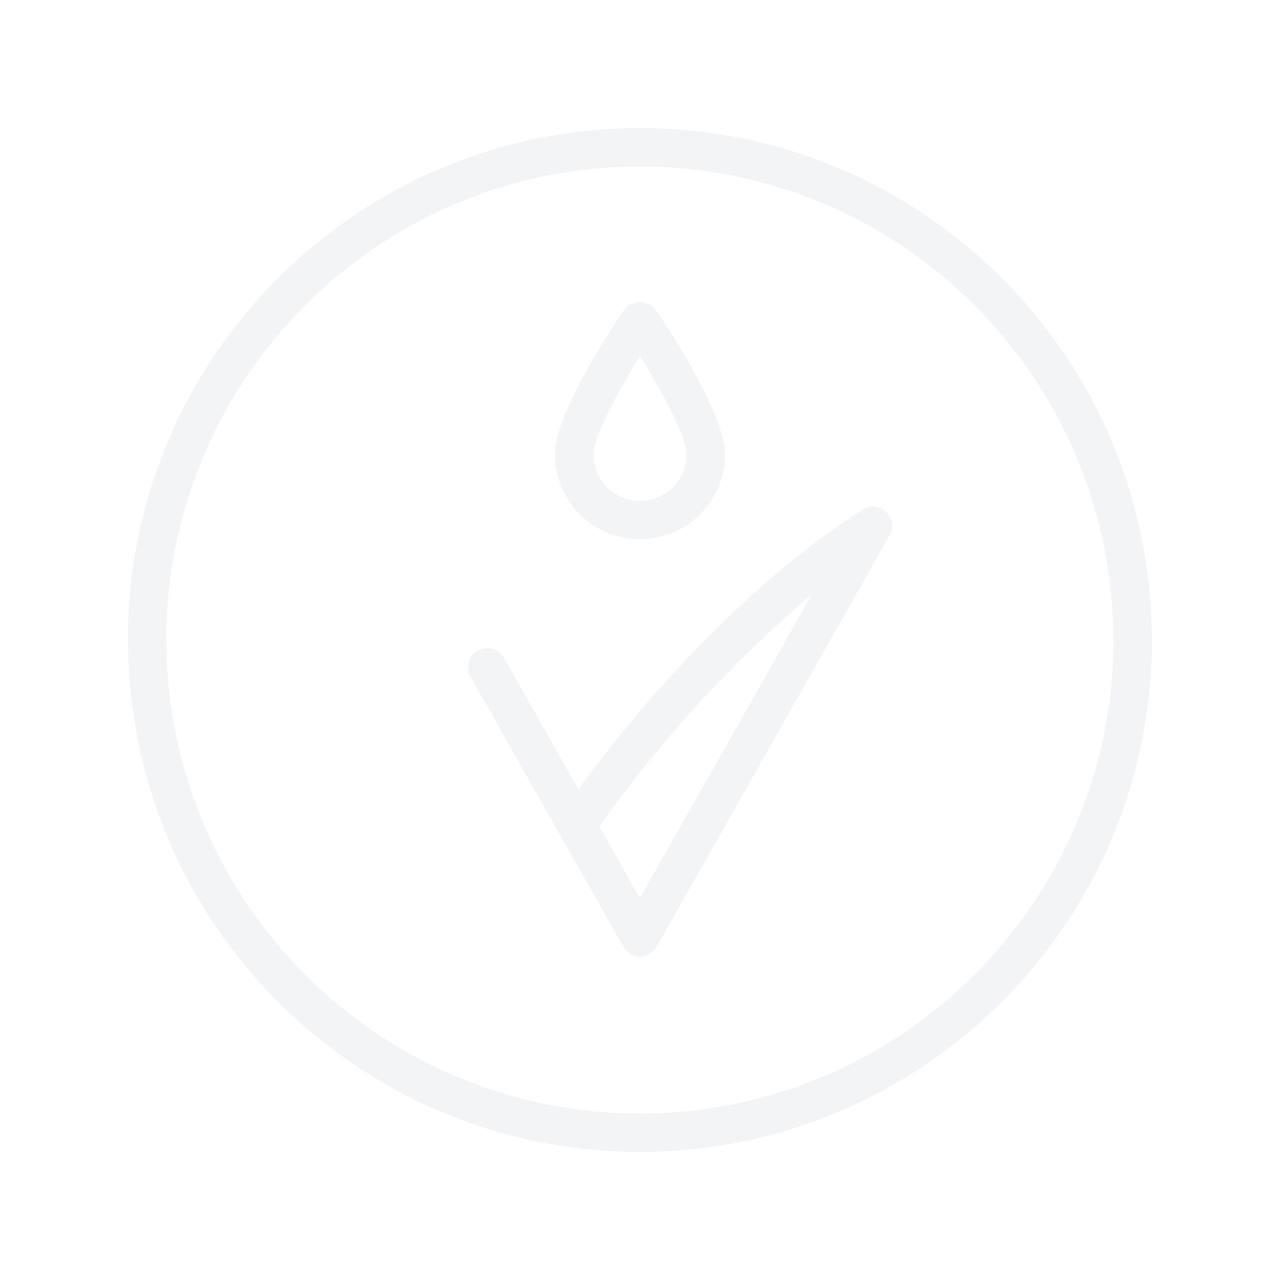 PAUL MITCHELL Clarifying Shampoo Three шампунь «глубокая очистка» 300ml